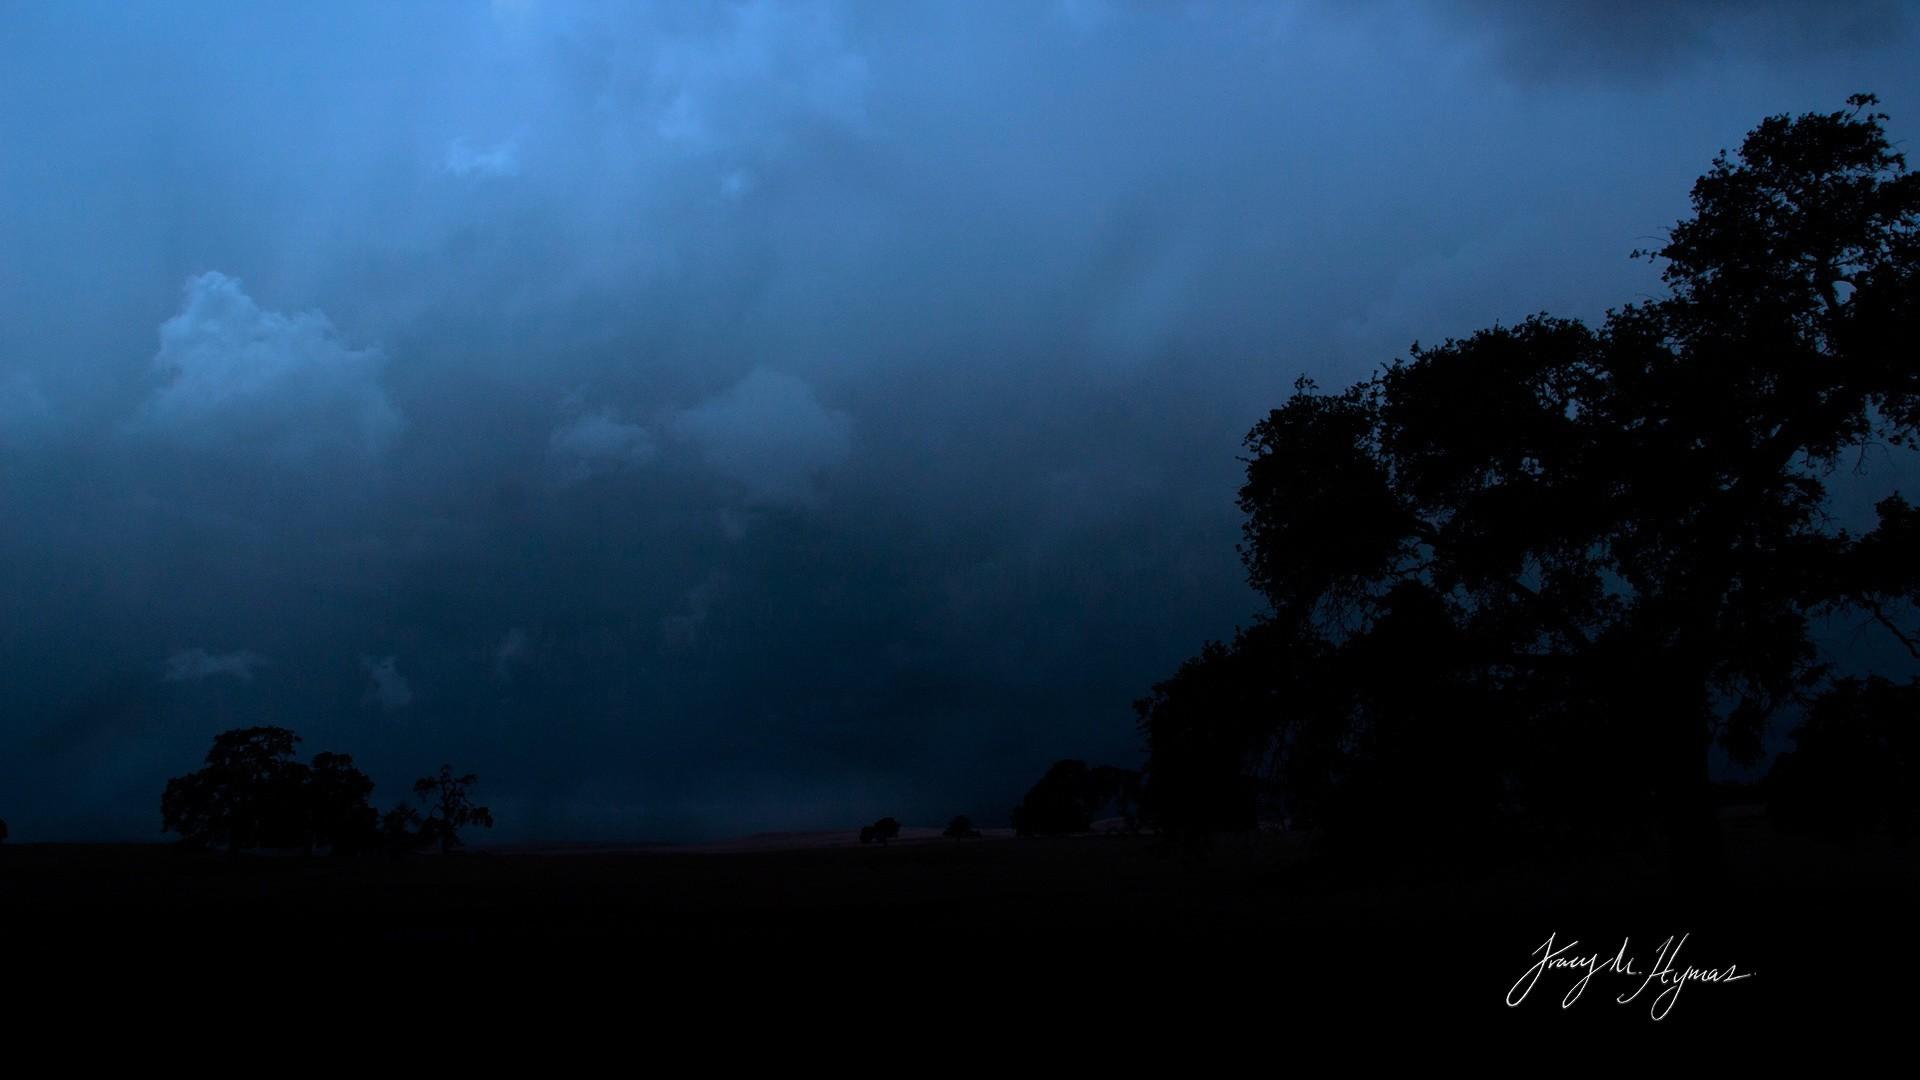 dark skies wallpaper ·①